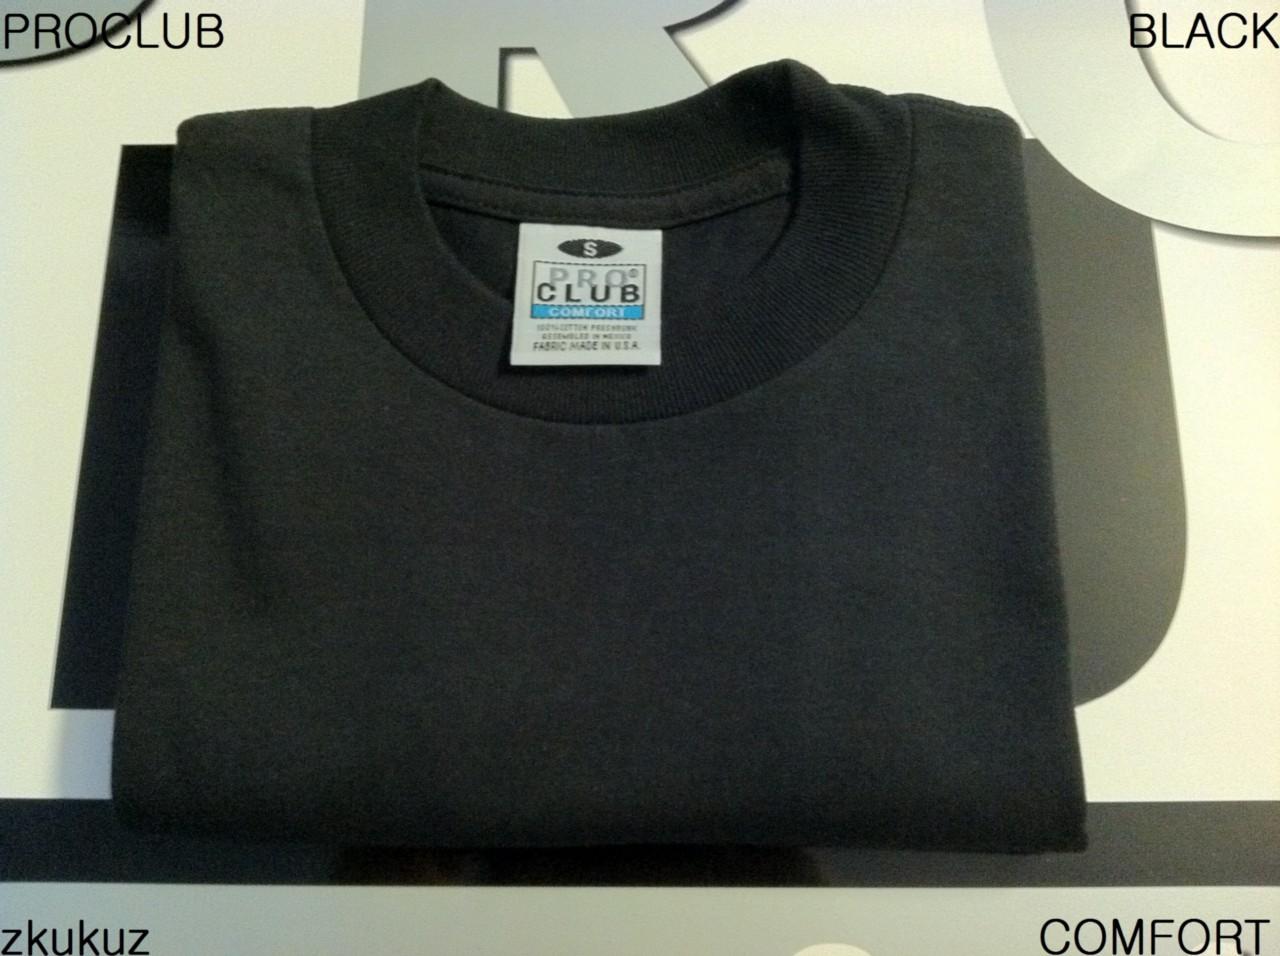 4b88e594c9d Where Can I Buy Pro Club Shirts Near Me